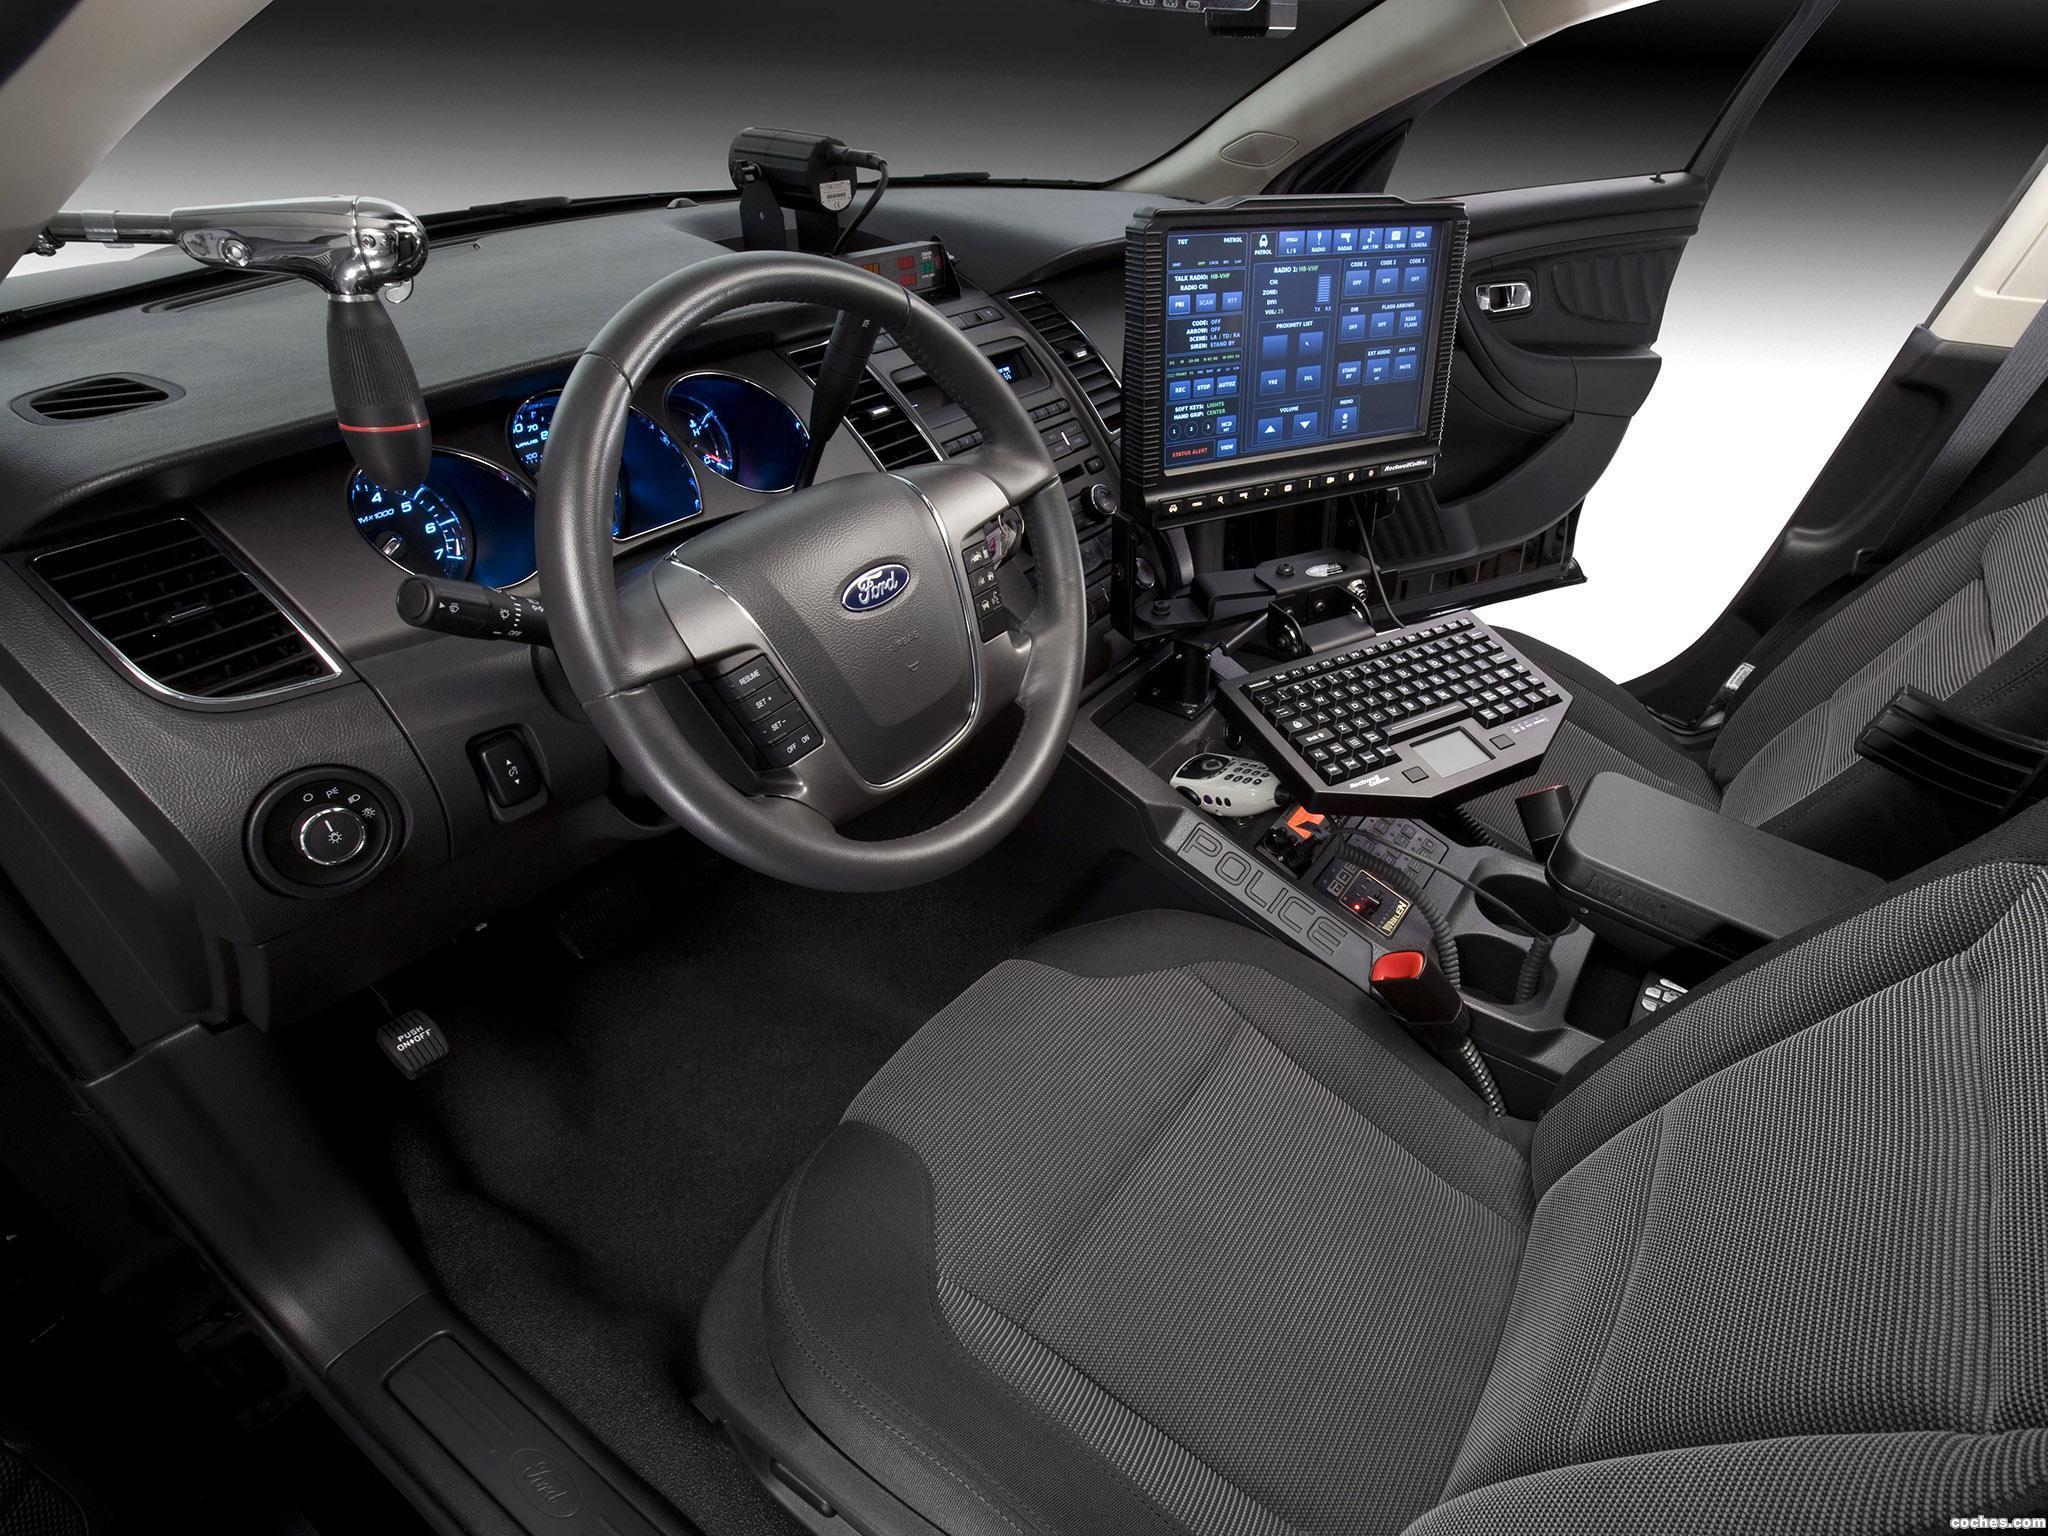 Foto 6 de Ford Interceptor Police Concept 2010